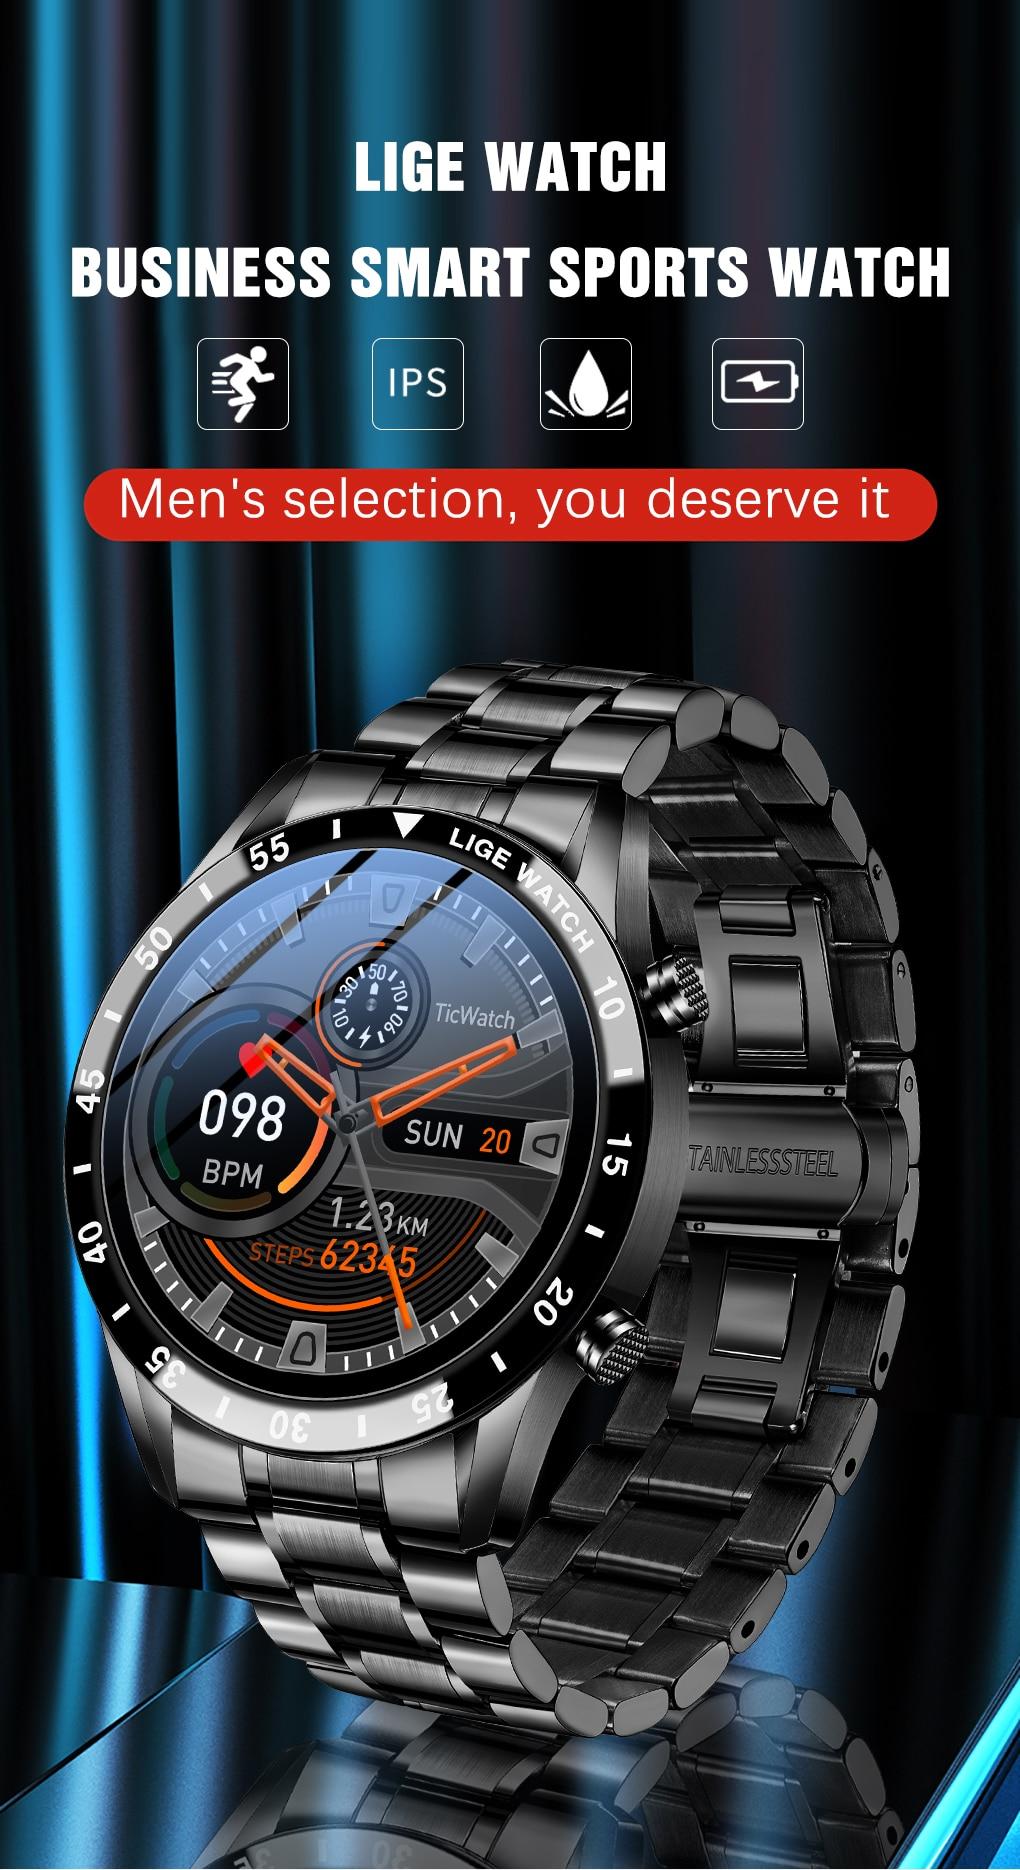 H1f4e1164094a4f42a69c1196db44d3e0y LIGE 2021 Full circle touch screen steel Band luxury Bluetooth call Men smart watch Waterproof Sport Activity fitness watch+box